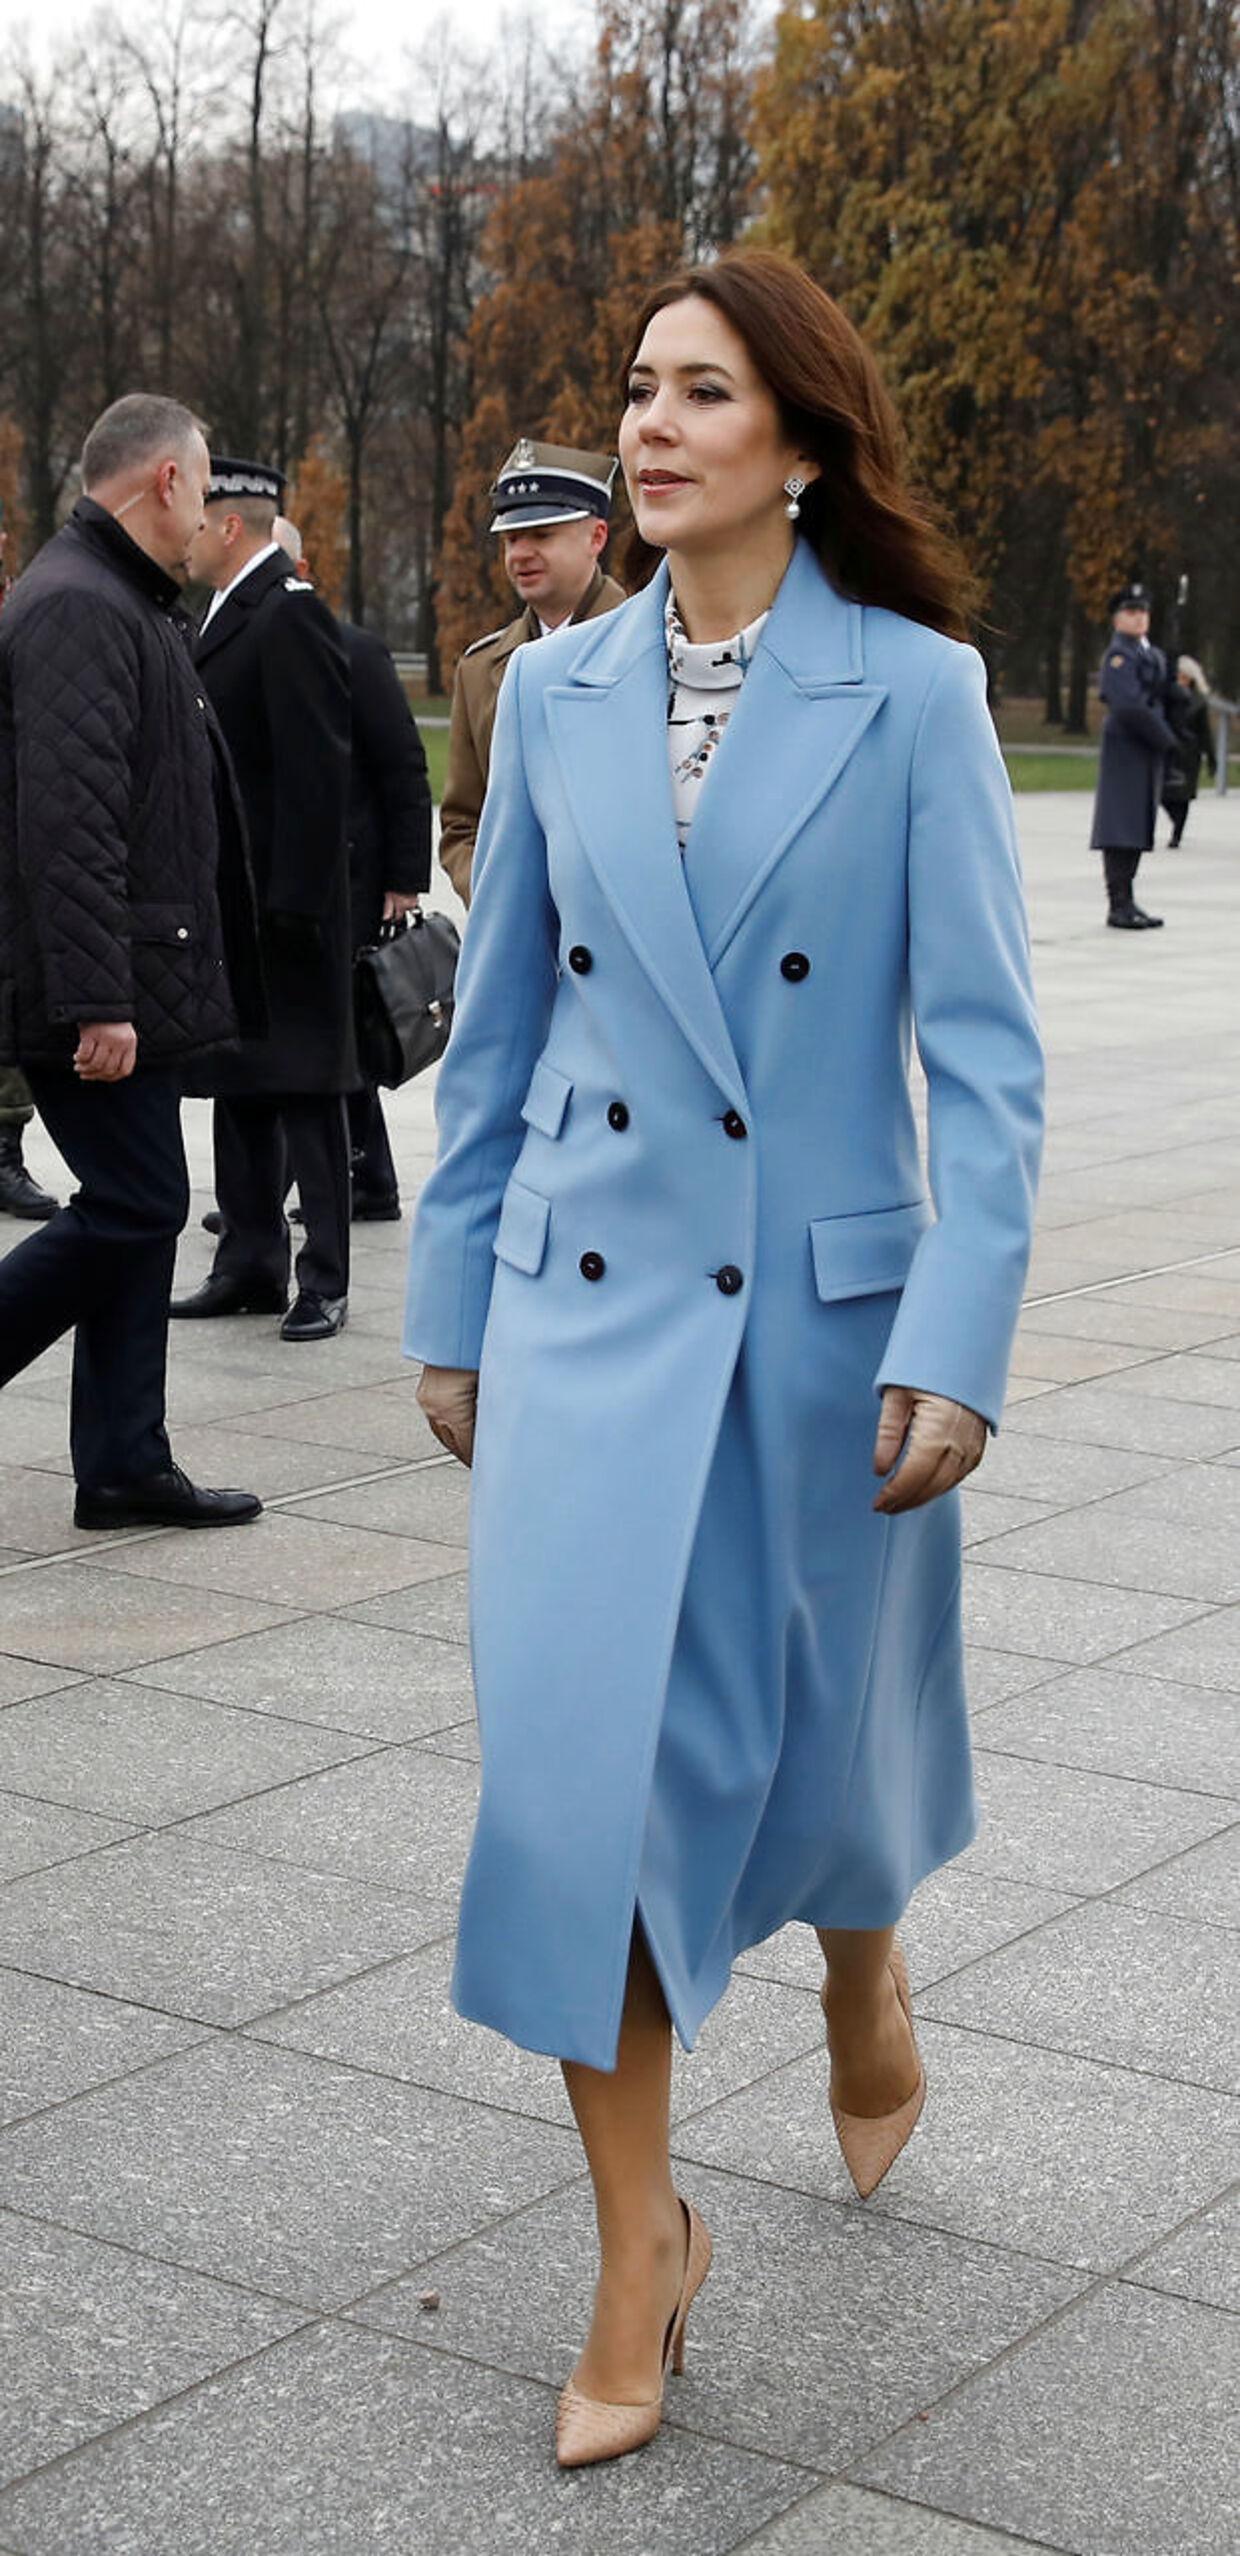 Mary fik ros i de britiske medier for sin fine, blå frakke.